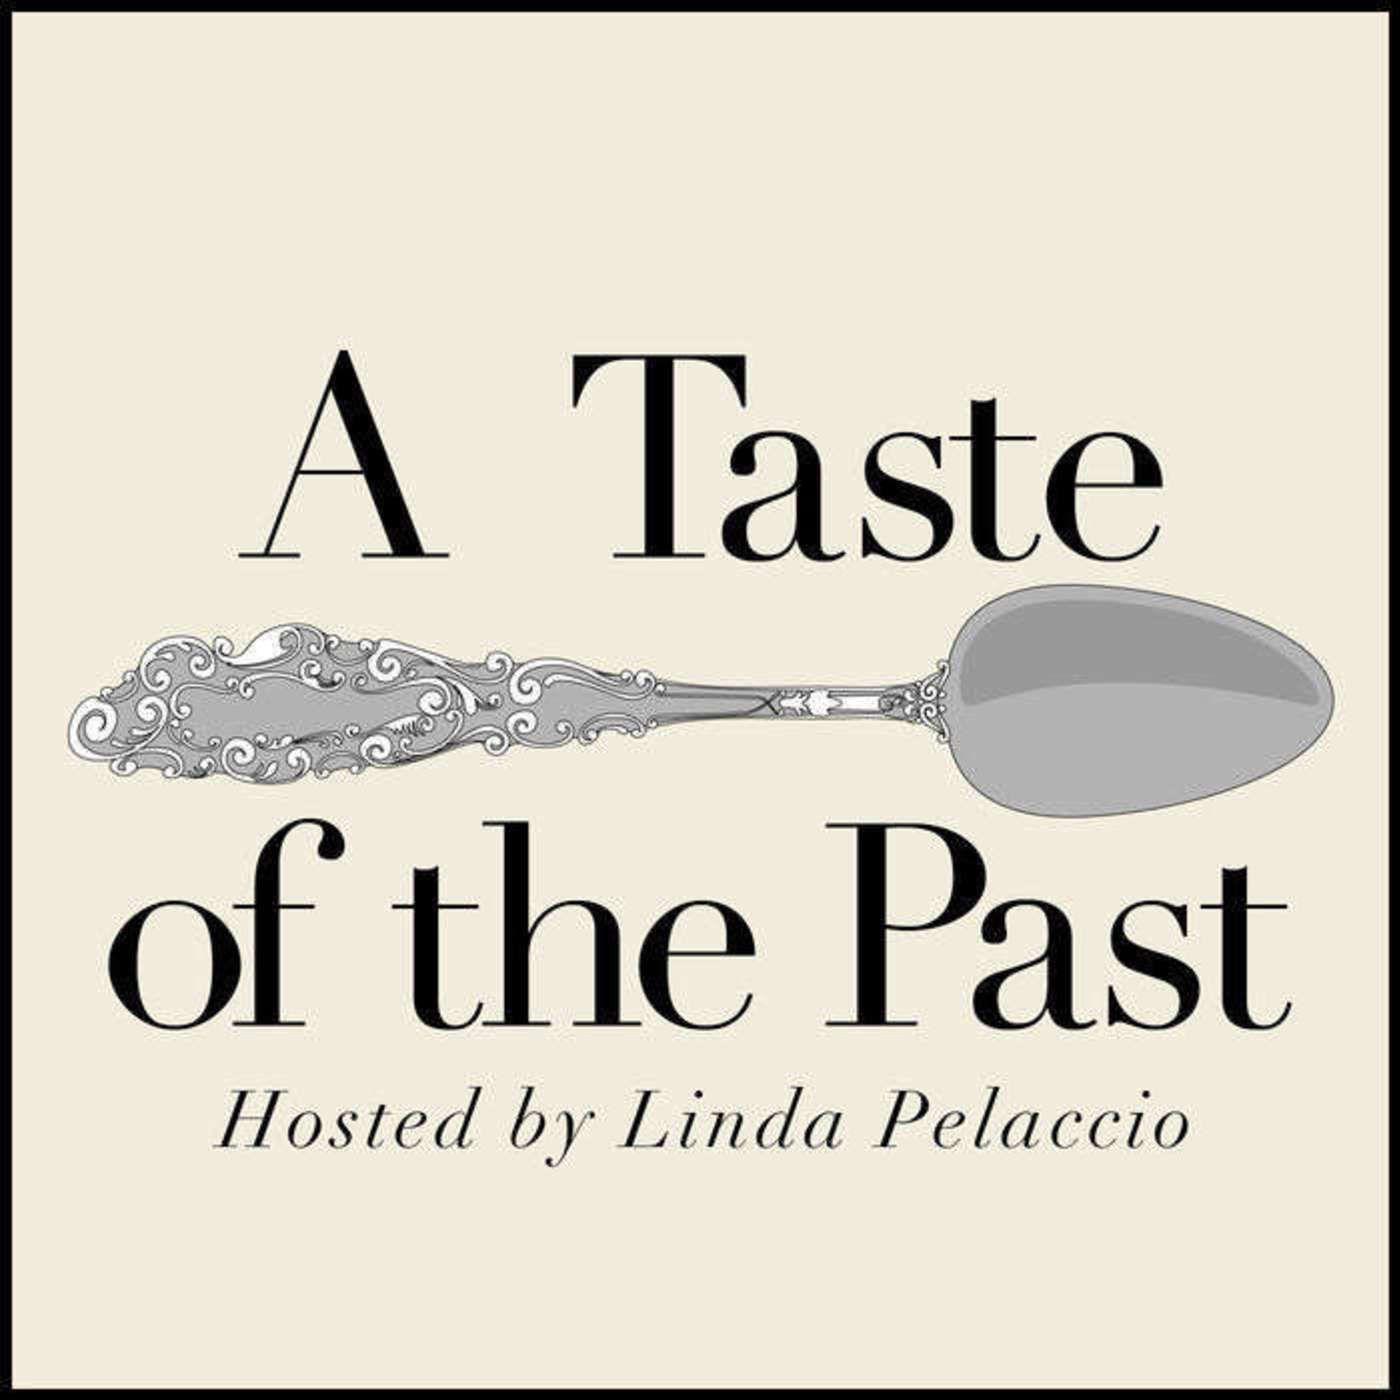 Episode 90: Fabio Parasecoli